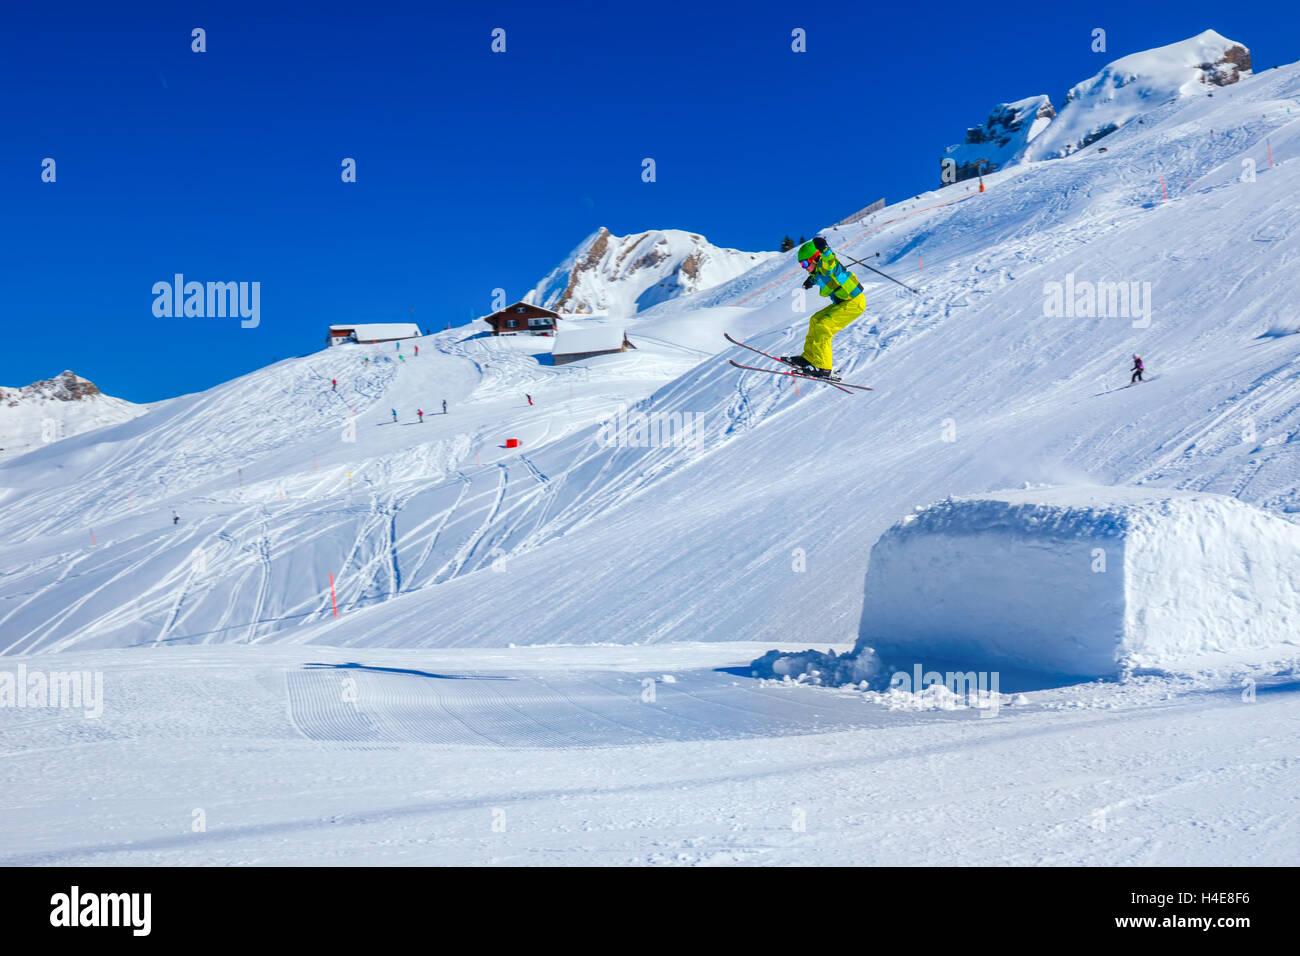 Flying skier skiing in Hoch-Ybrig mountain resort, Switzerland - Stock Image